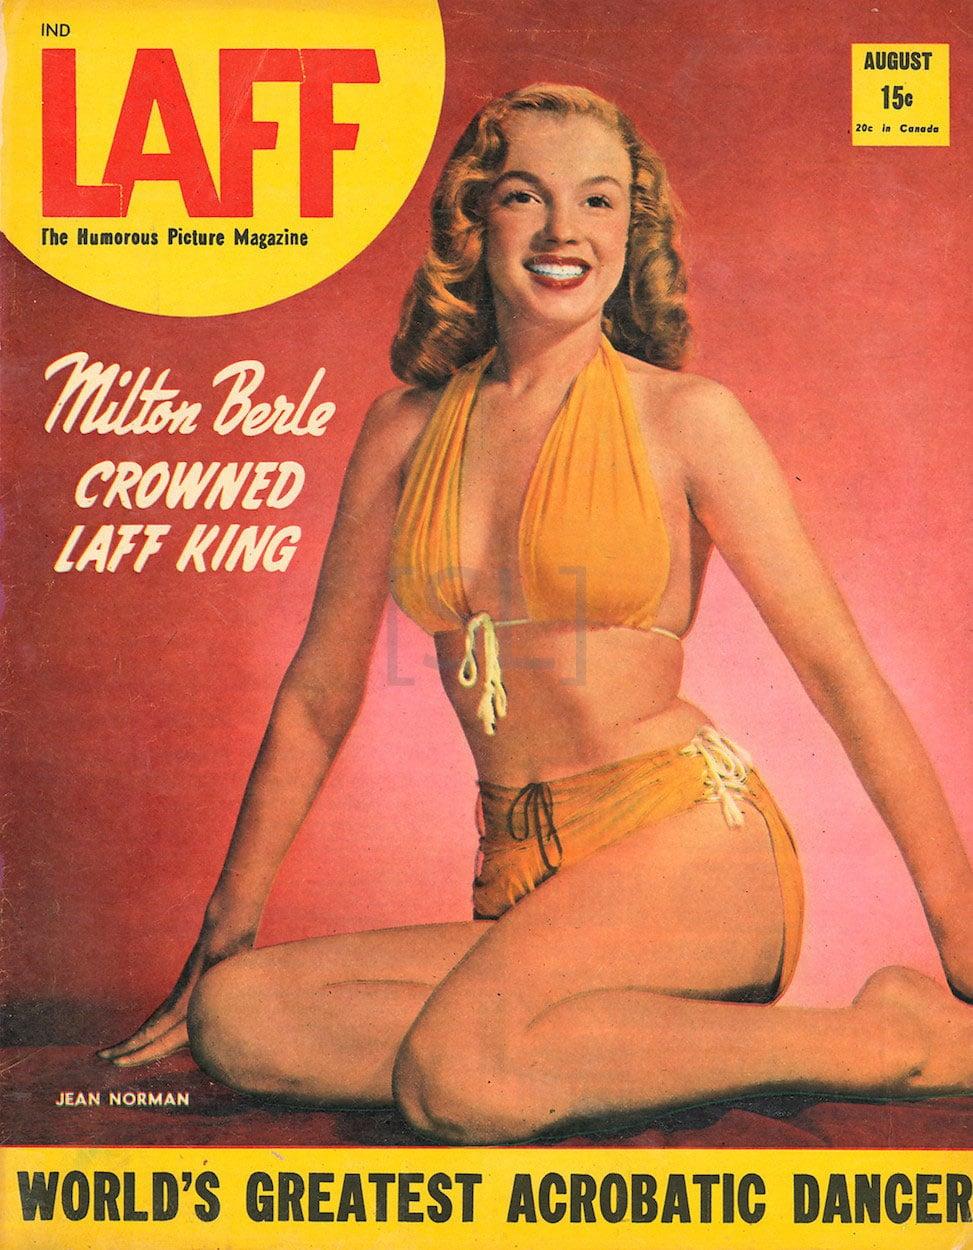 Laff, The Humorous Picture Magazine